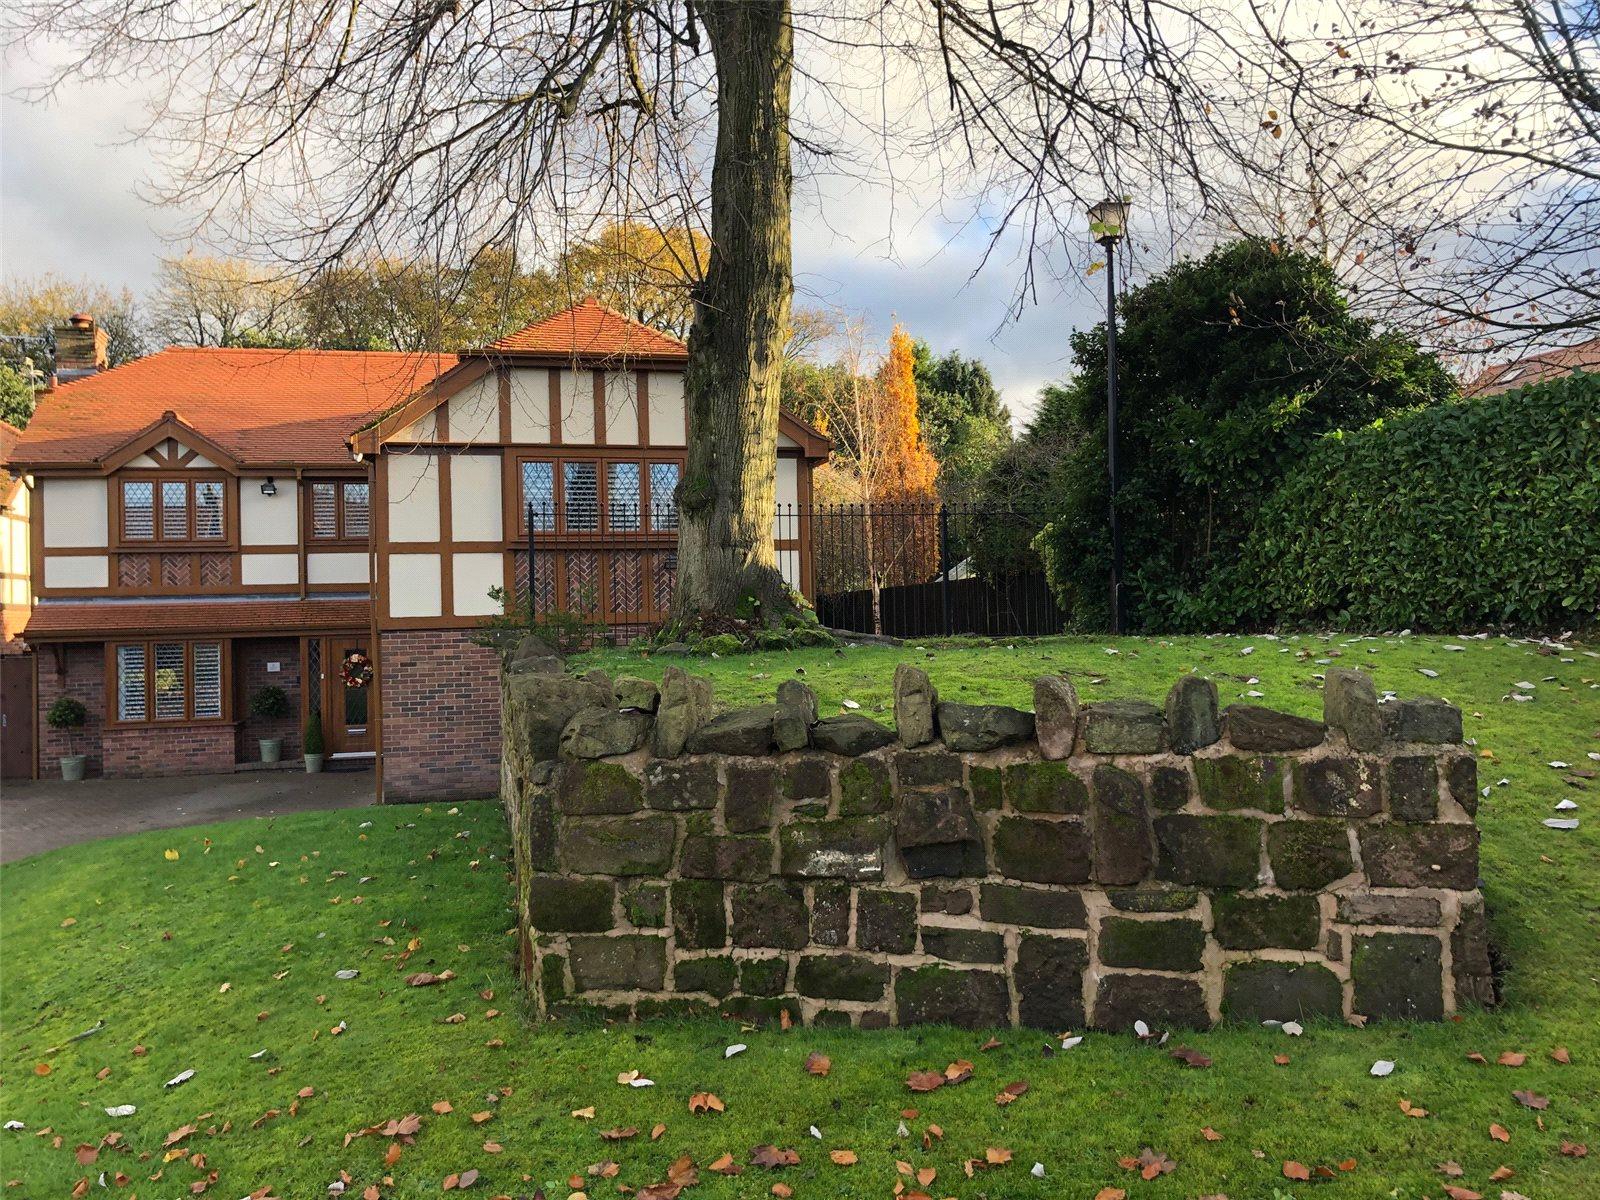 Ingleholme Gardens, Eccleston Park, Prescot, L34 2GD